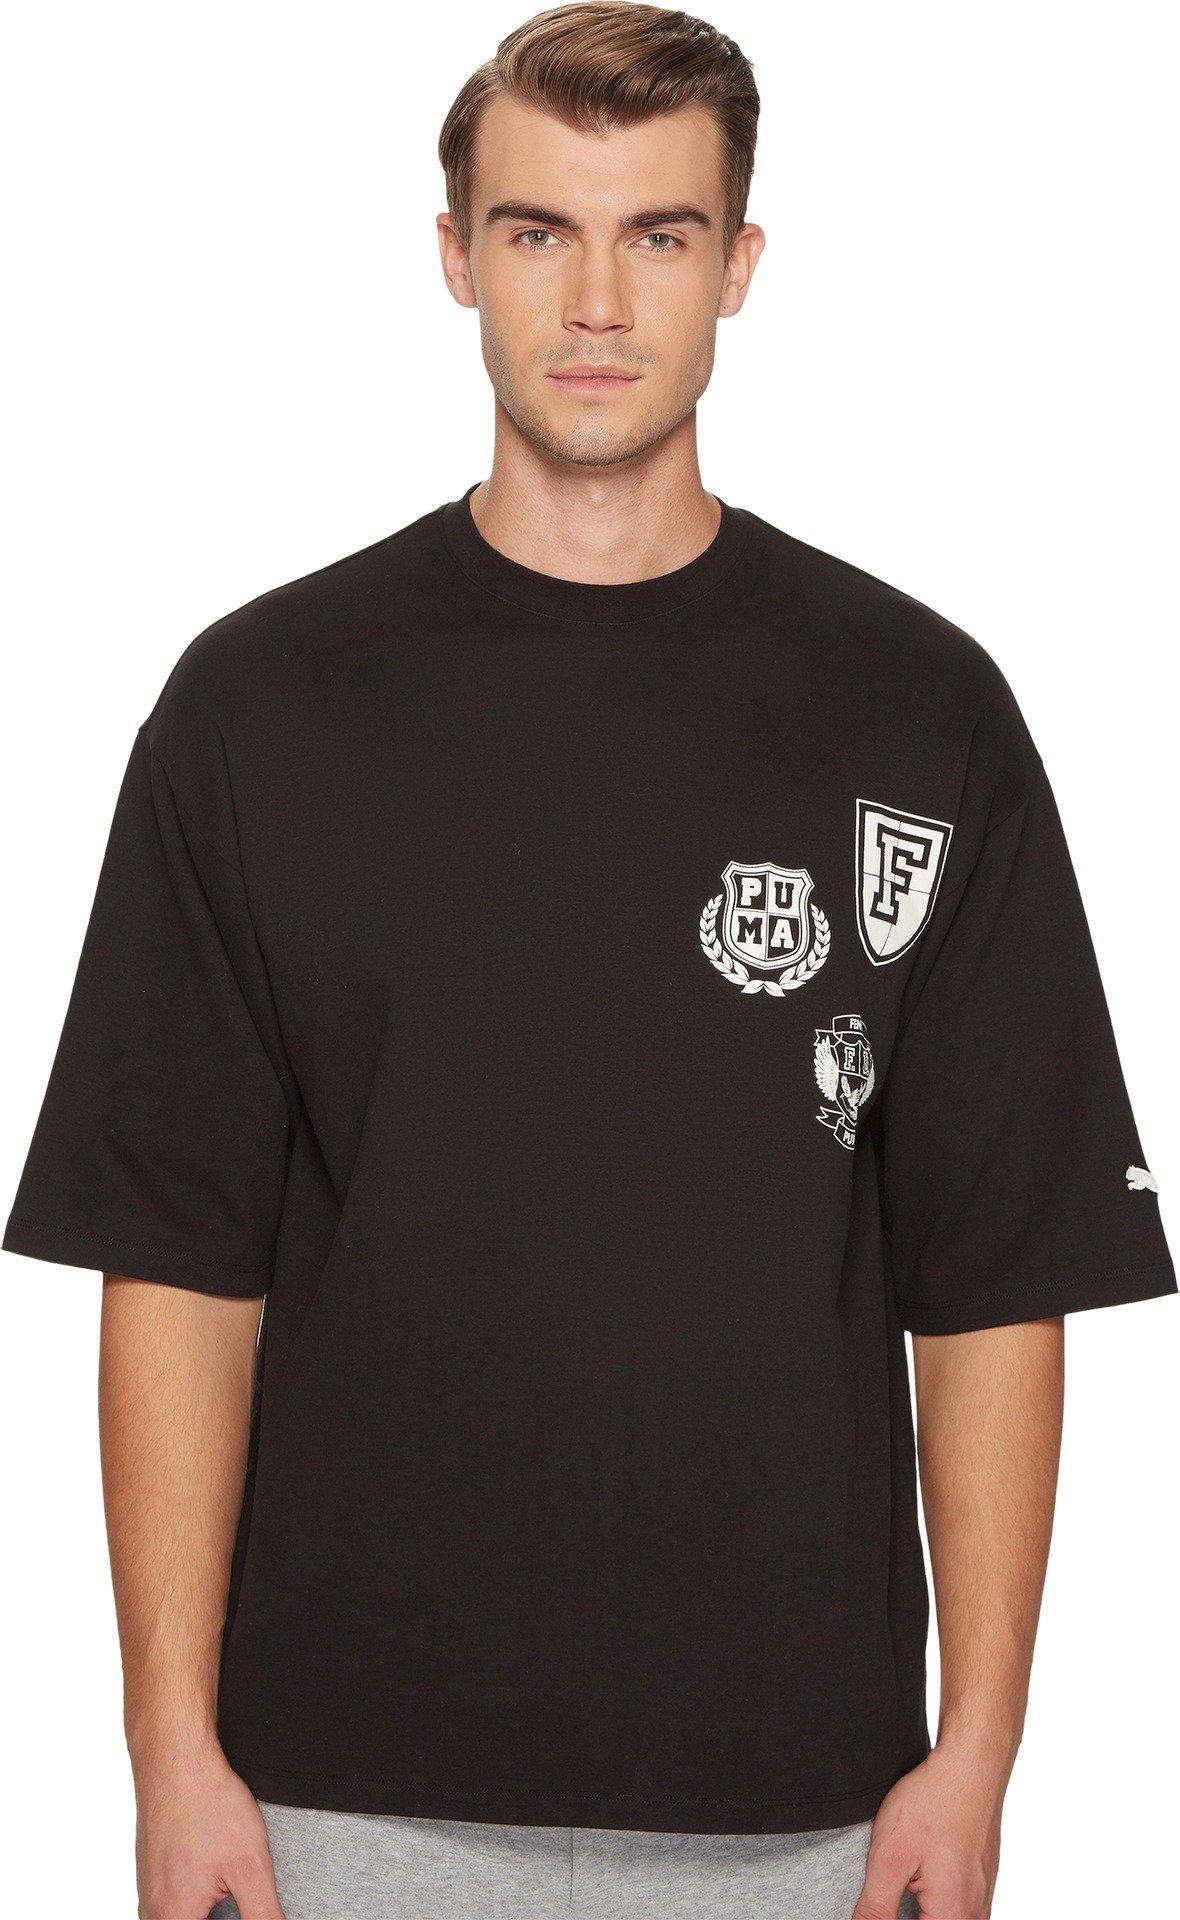 PUMA  Men's Puma x Fenty by Rihanna Short Sleeve Crew Neck T-Shirt Cotton Black Medium